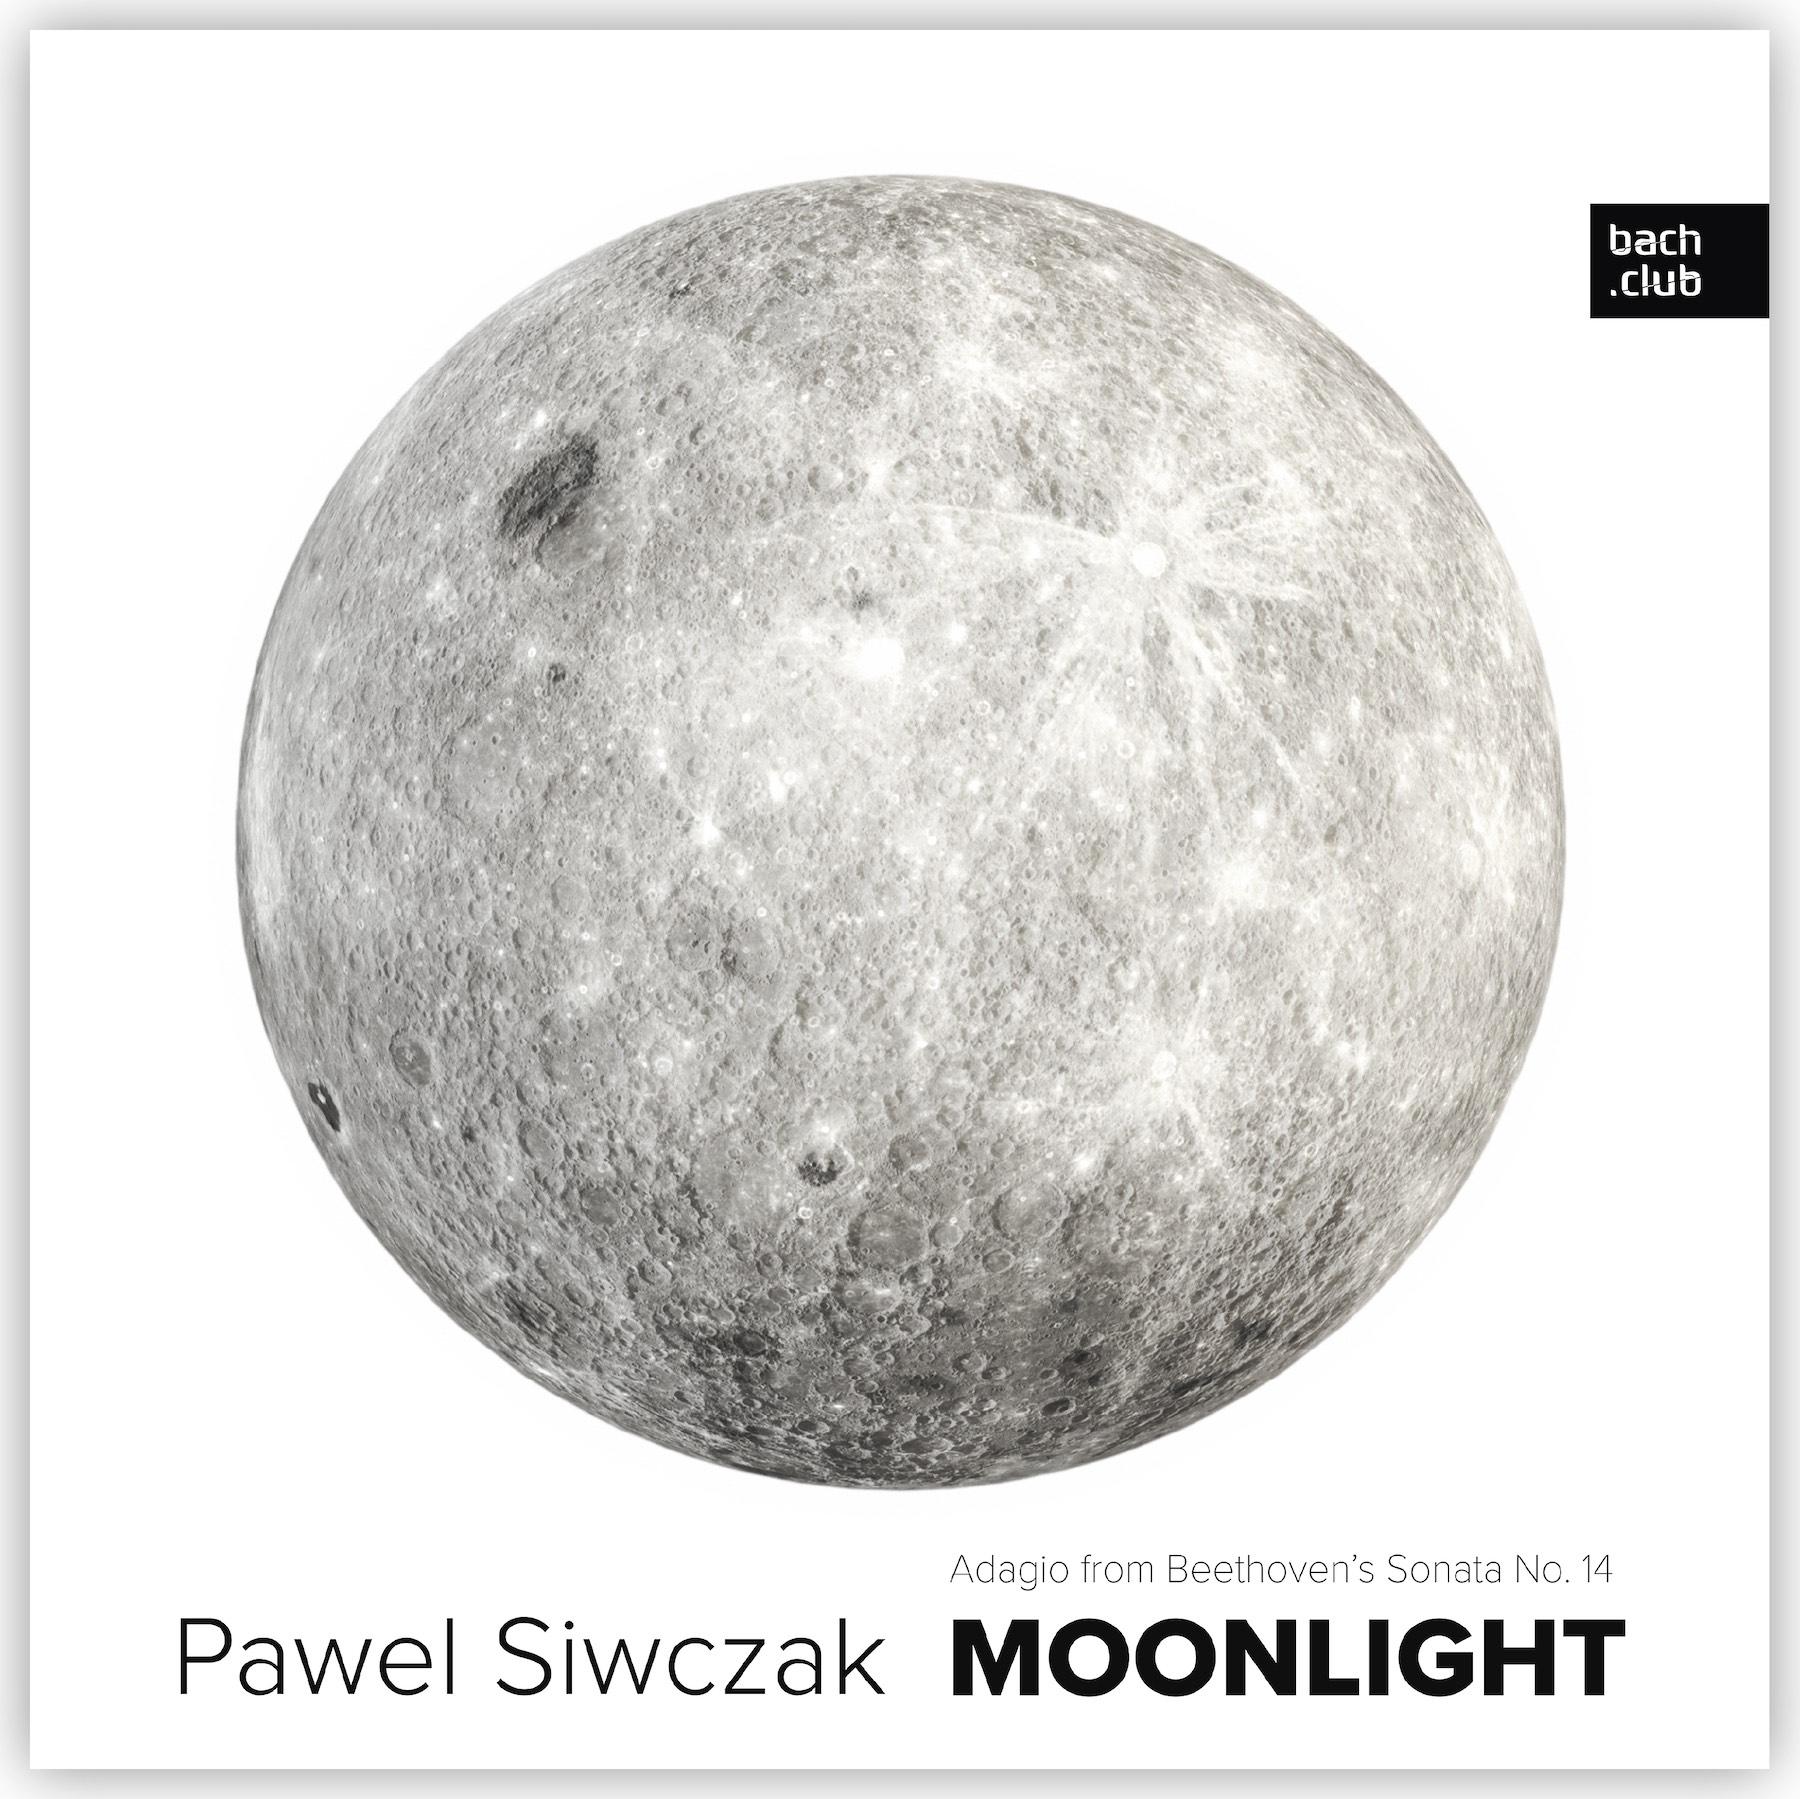 Pawel Siwczak: Adagio from Moonlight Sonata Cover